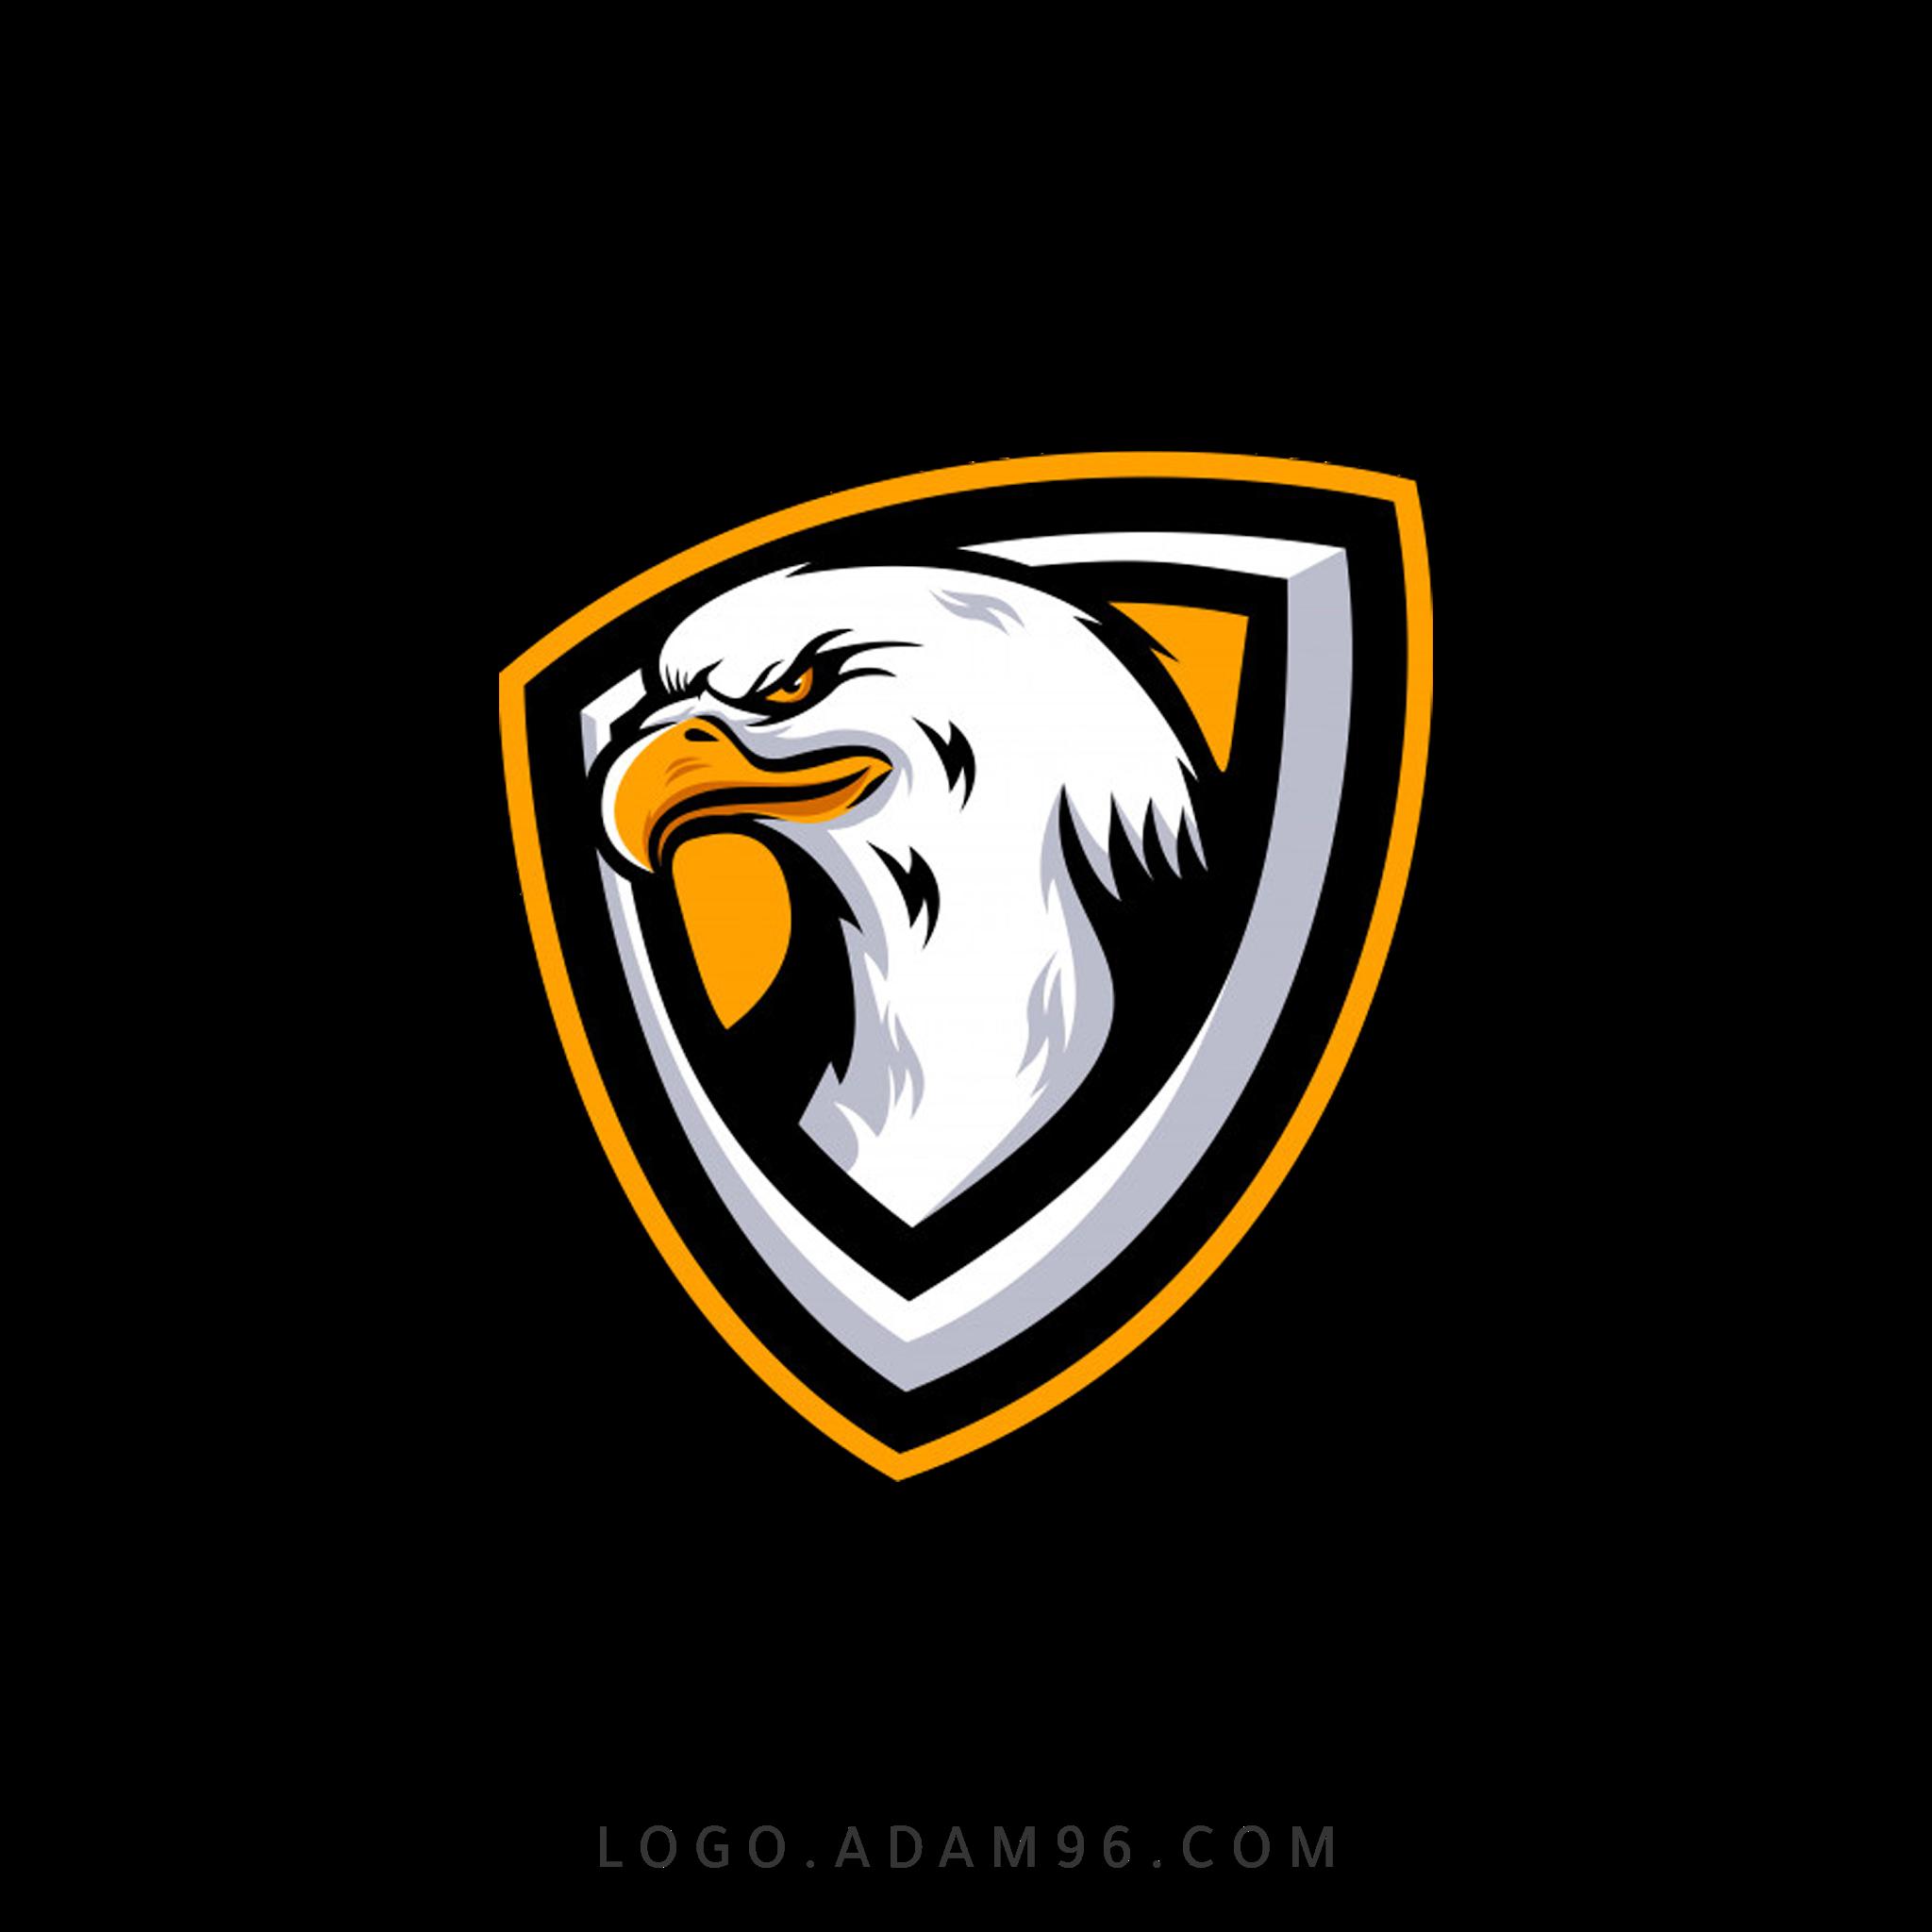 تحميل لوجو جيمنج مجاناً بدون اسم شعار بصيغة PNG